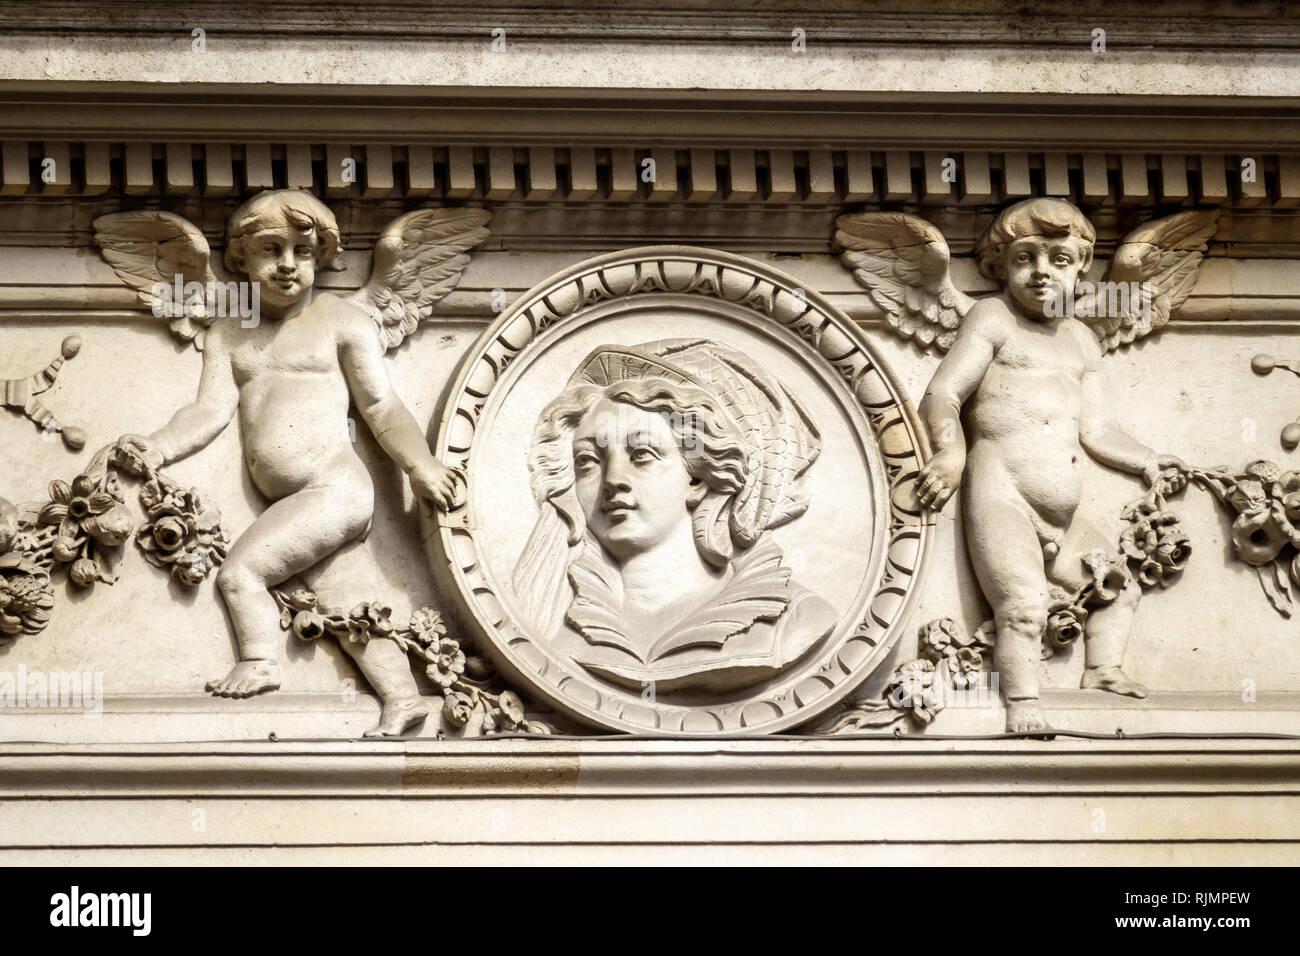 United Kingdom Great Britain England City of London Cornhill Street building exterior ornamental architecture bas-relief sculpture medallions decorati - Stock Image